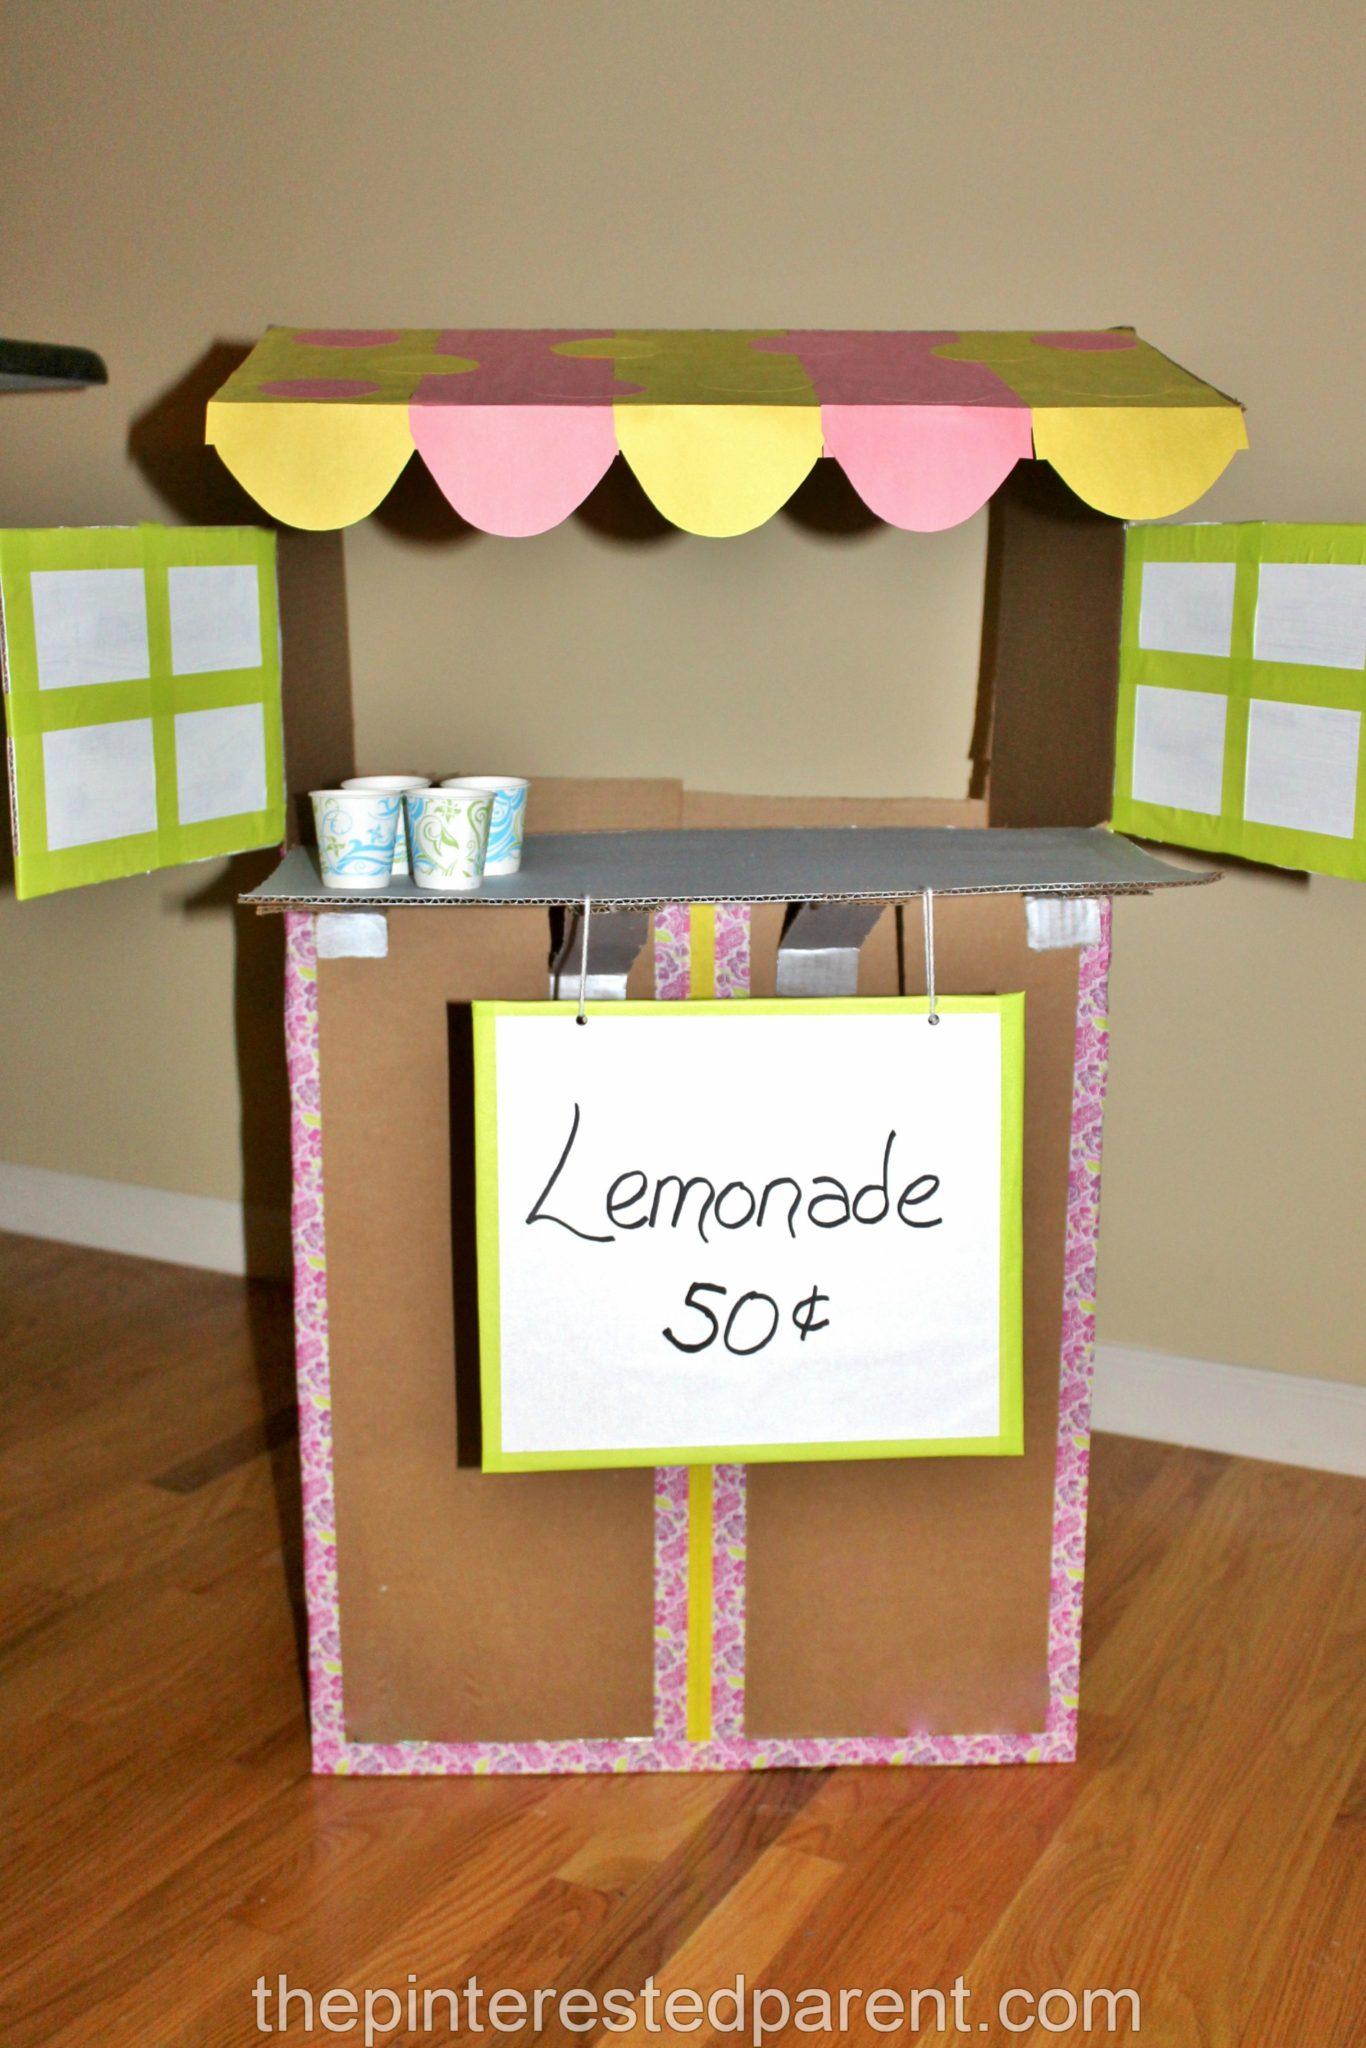 how to win lemonade stand